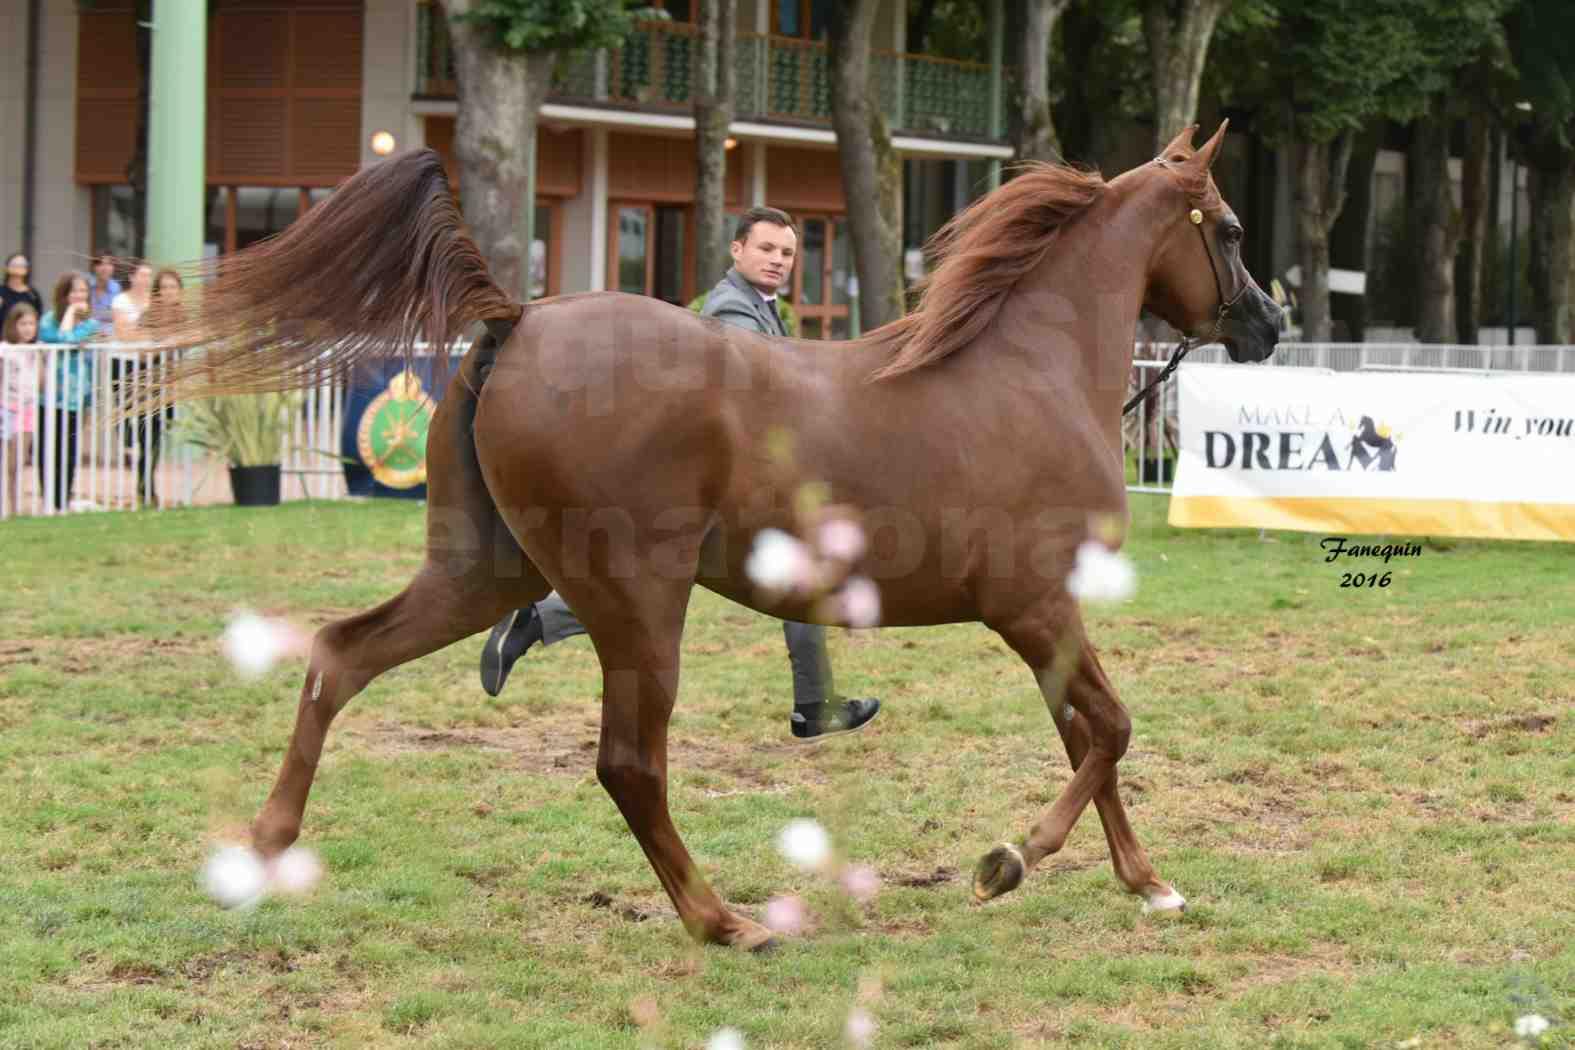 International Arabian Horse Show B de VICHY 2016 - PEARL DE DJOON - Notre Sélection - 17